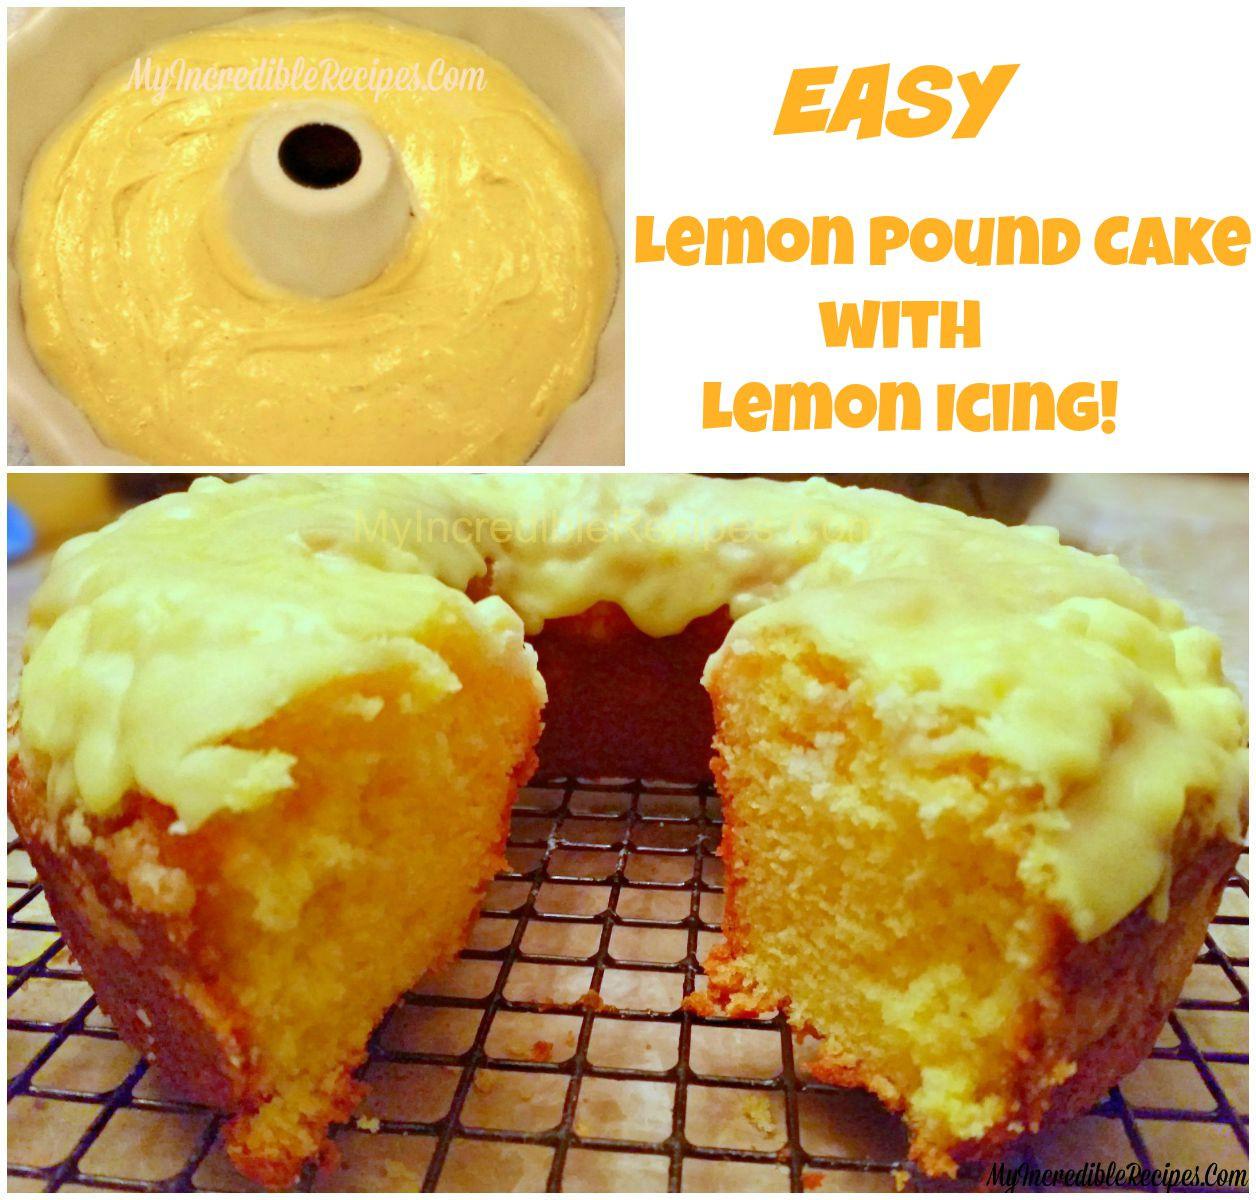 Easy Lemon Pound Cake  Easy Lemon Pound Cake with Lemon Icing